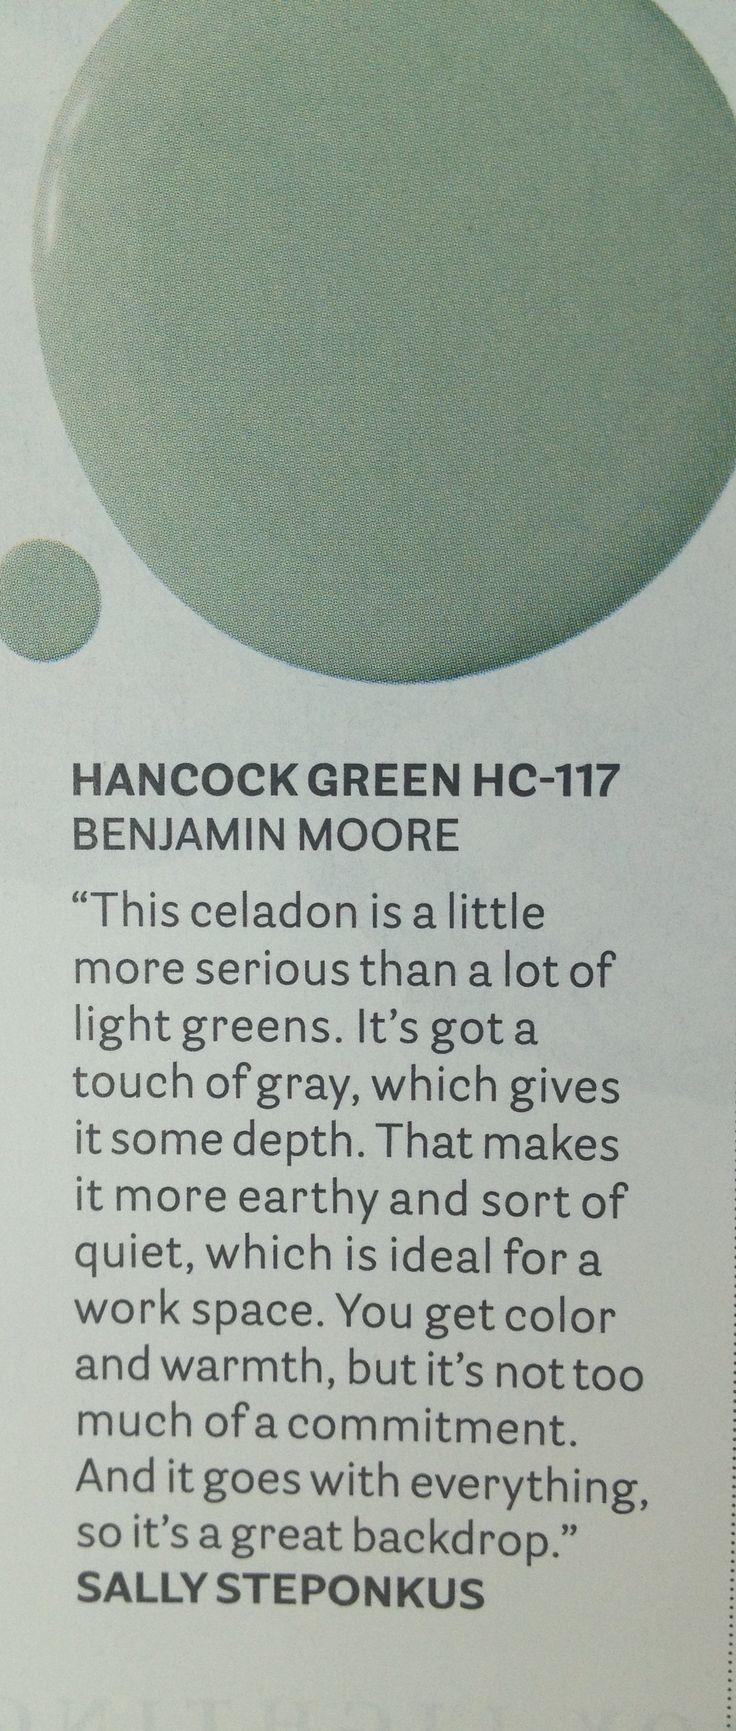 Benjamin Moore : Hancock green HC 117